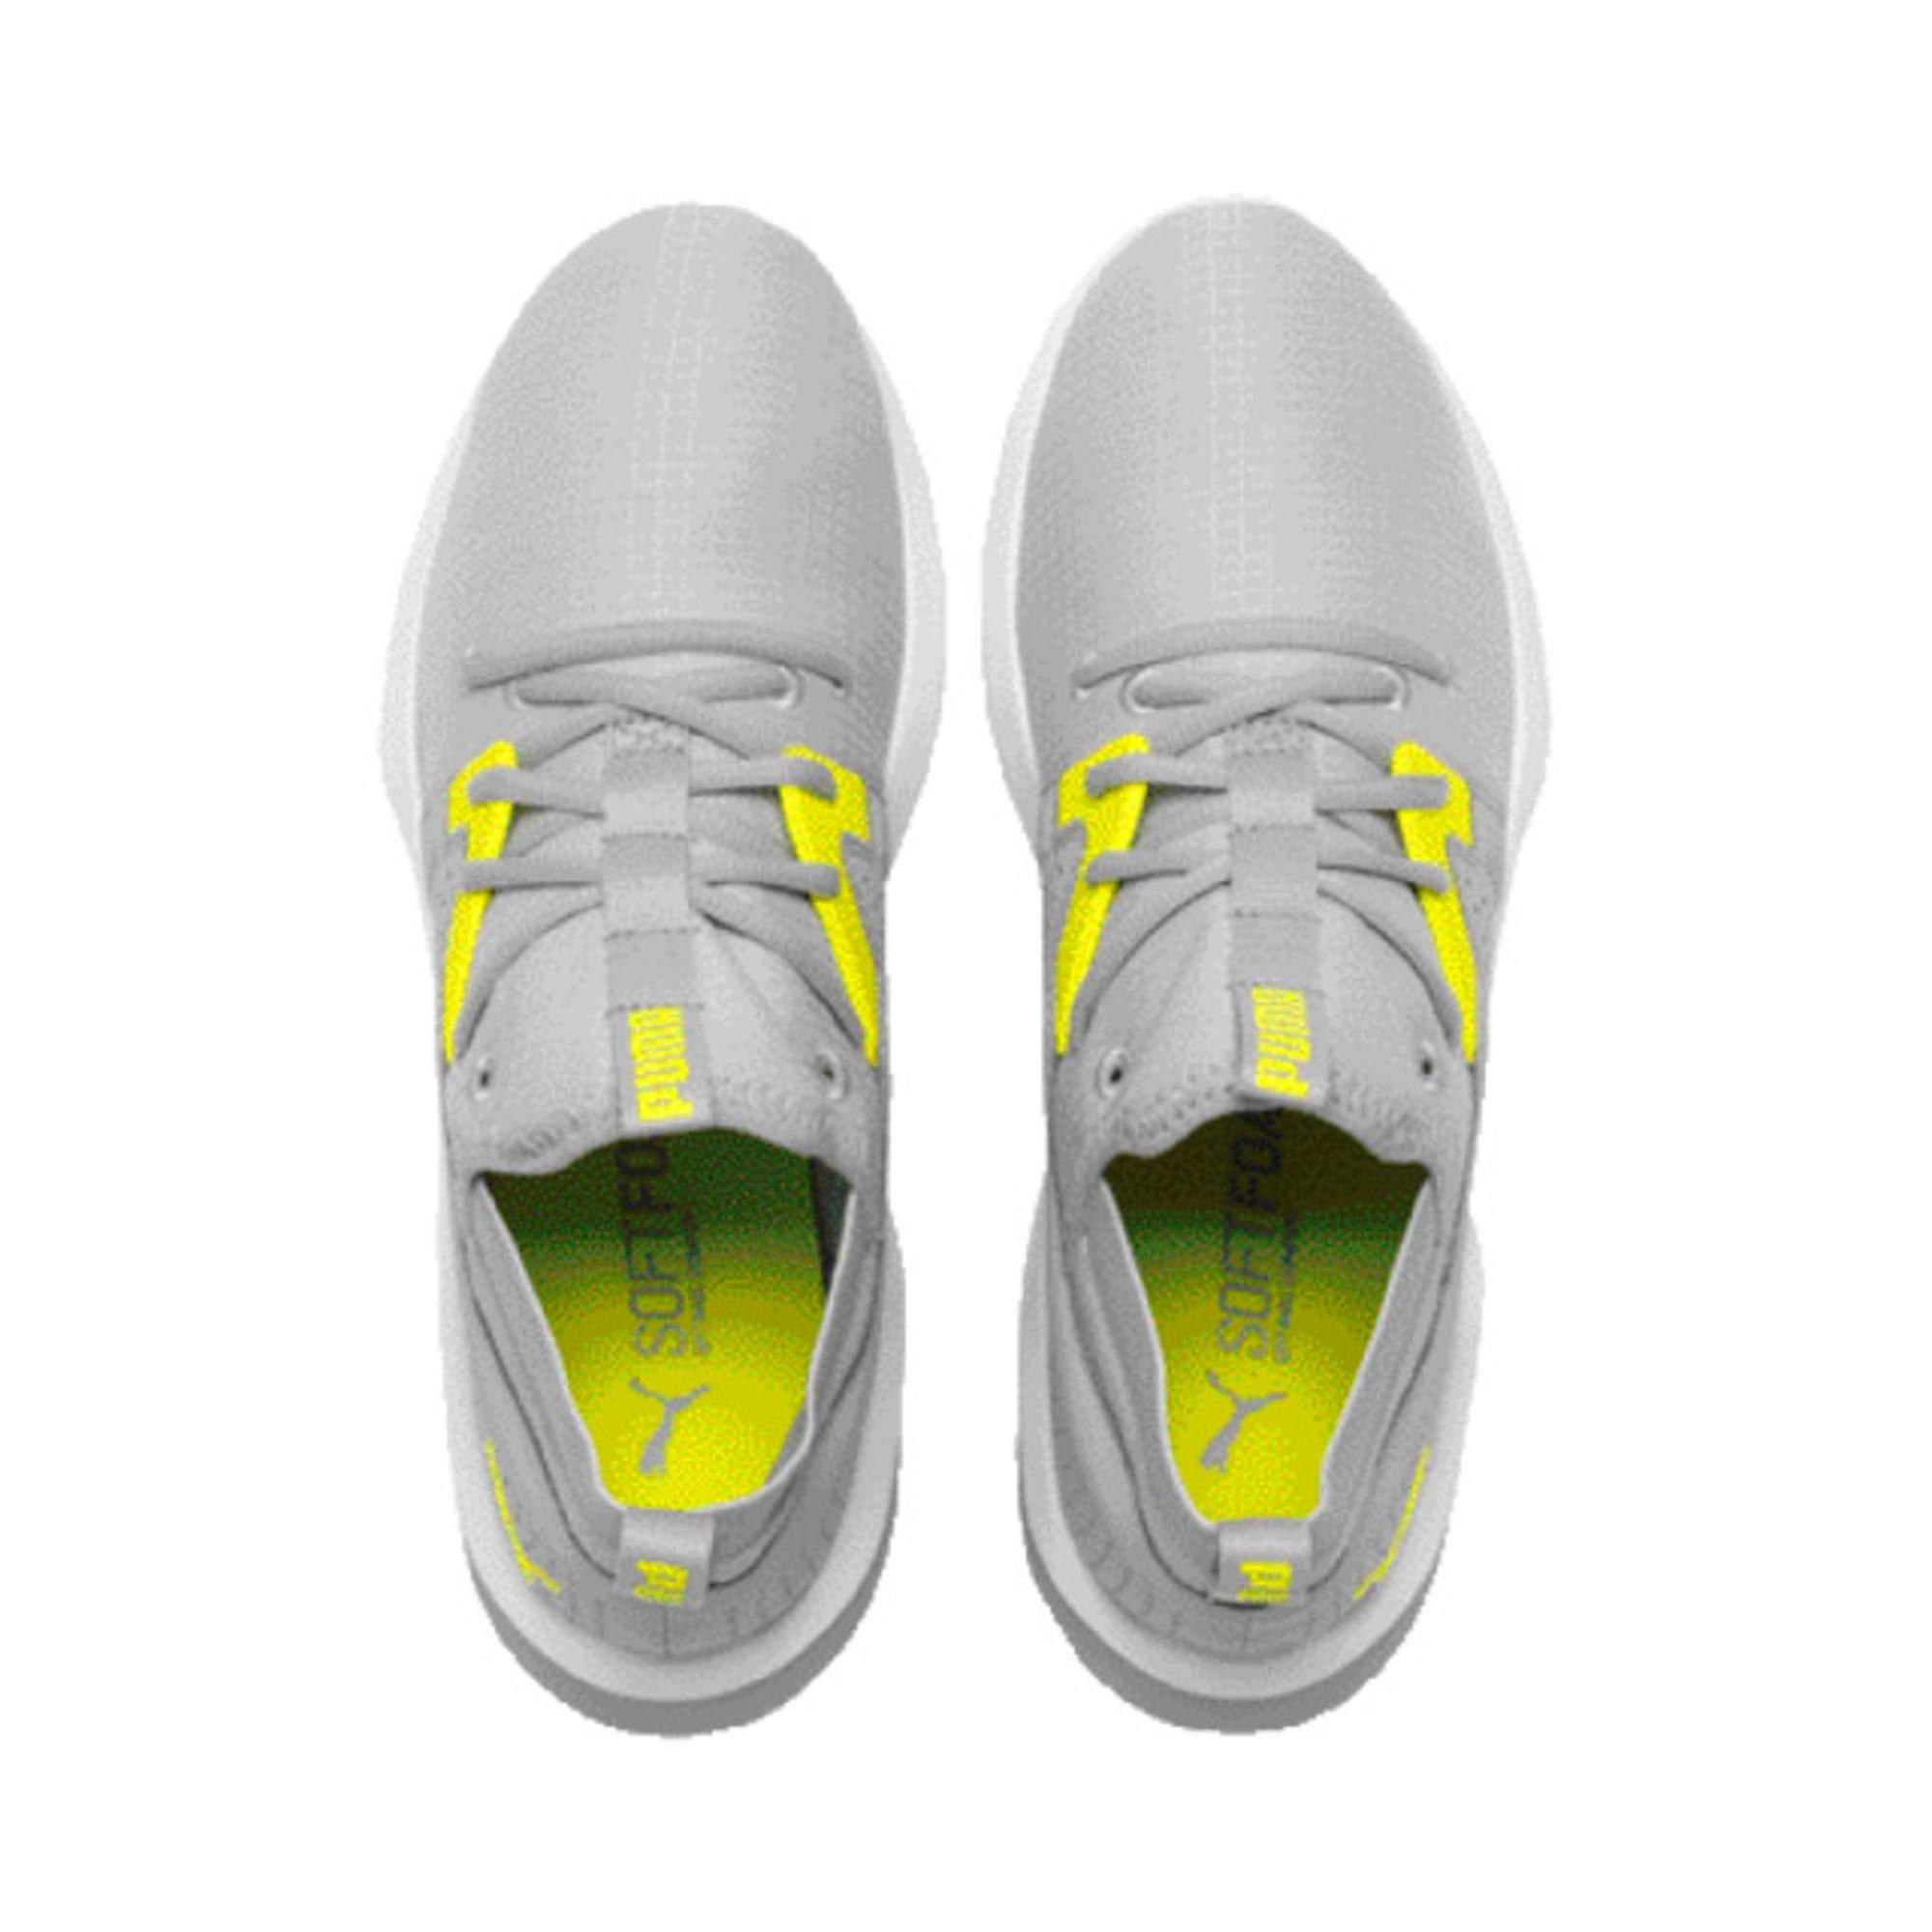 Thumbnail 4 of Emergence Lights Men's Running Shoes, High Rise-Yellow Alert, medium-IND